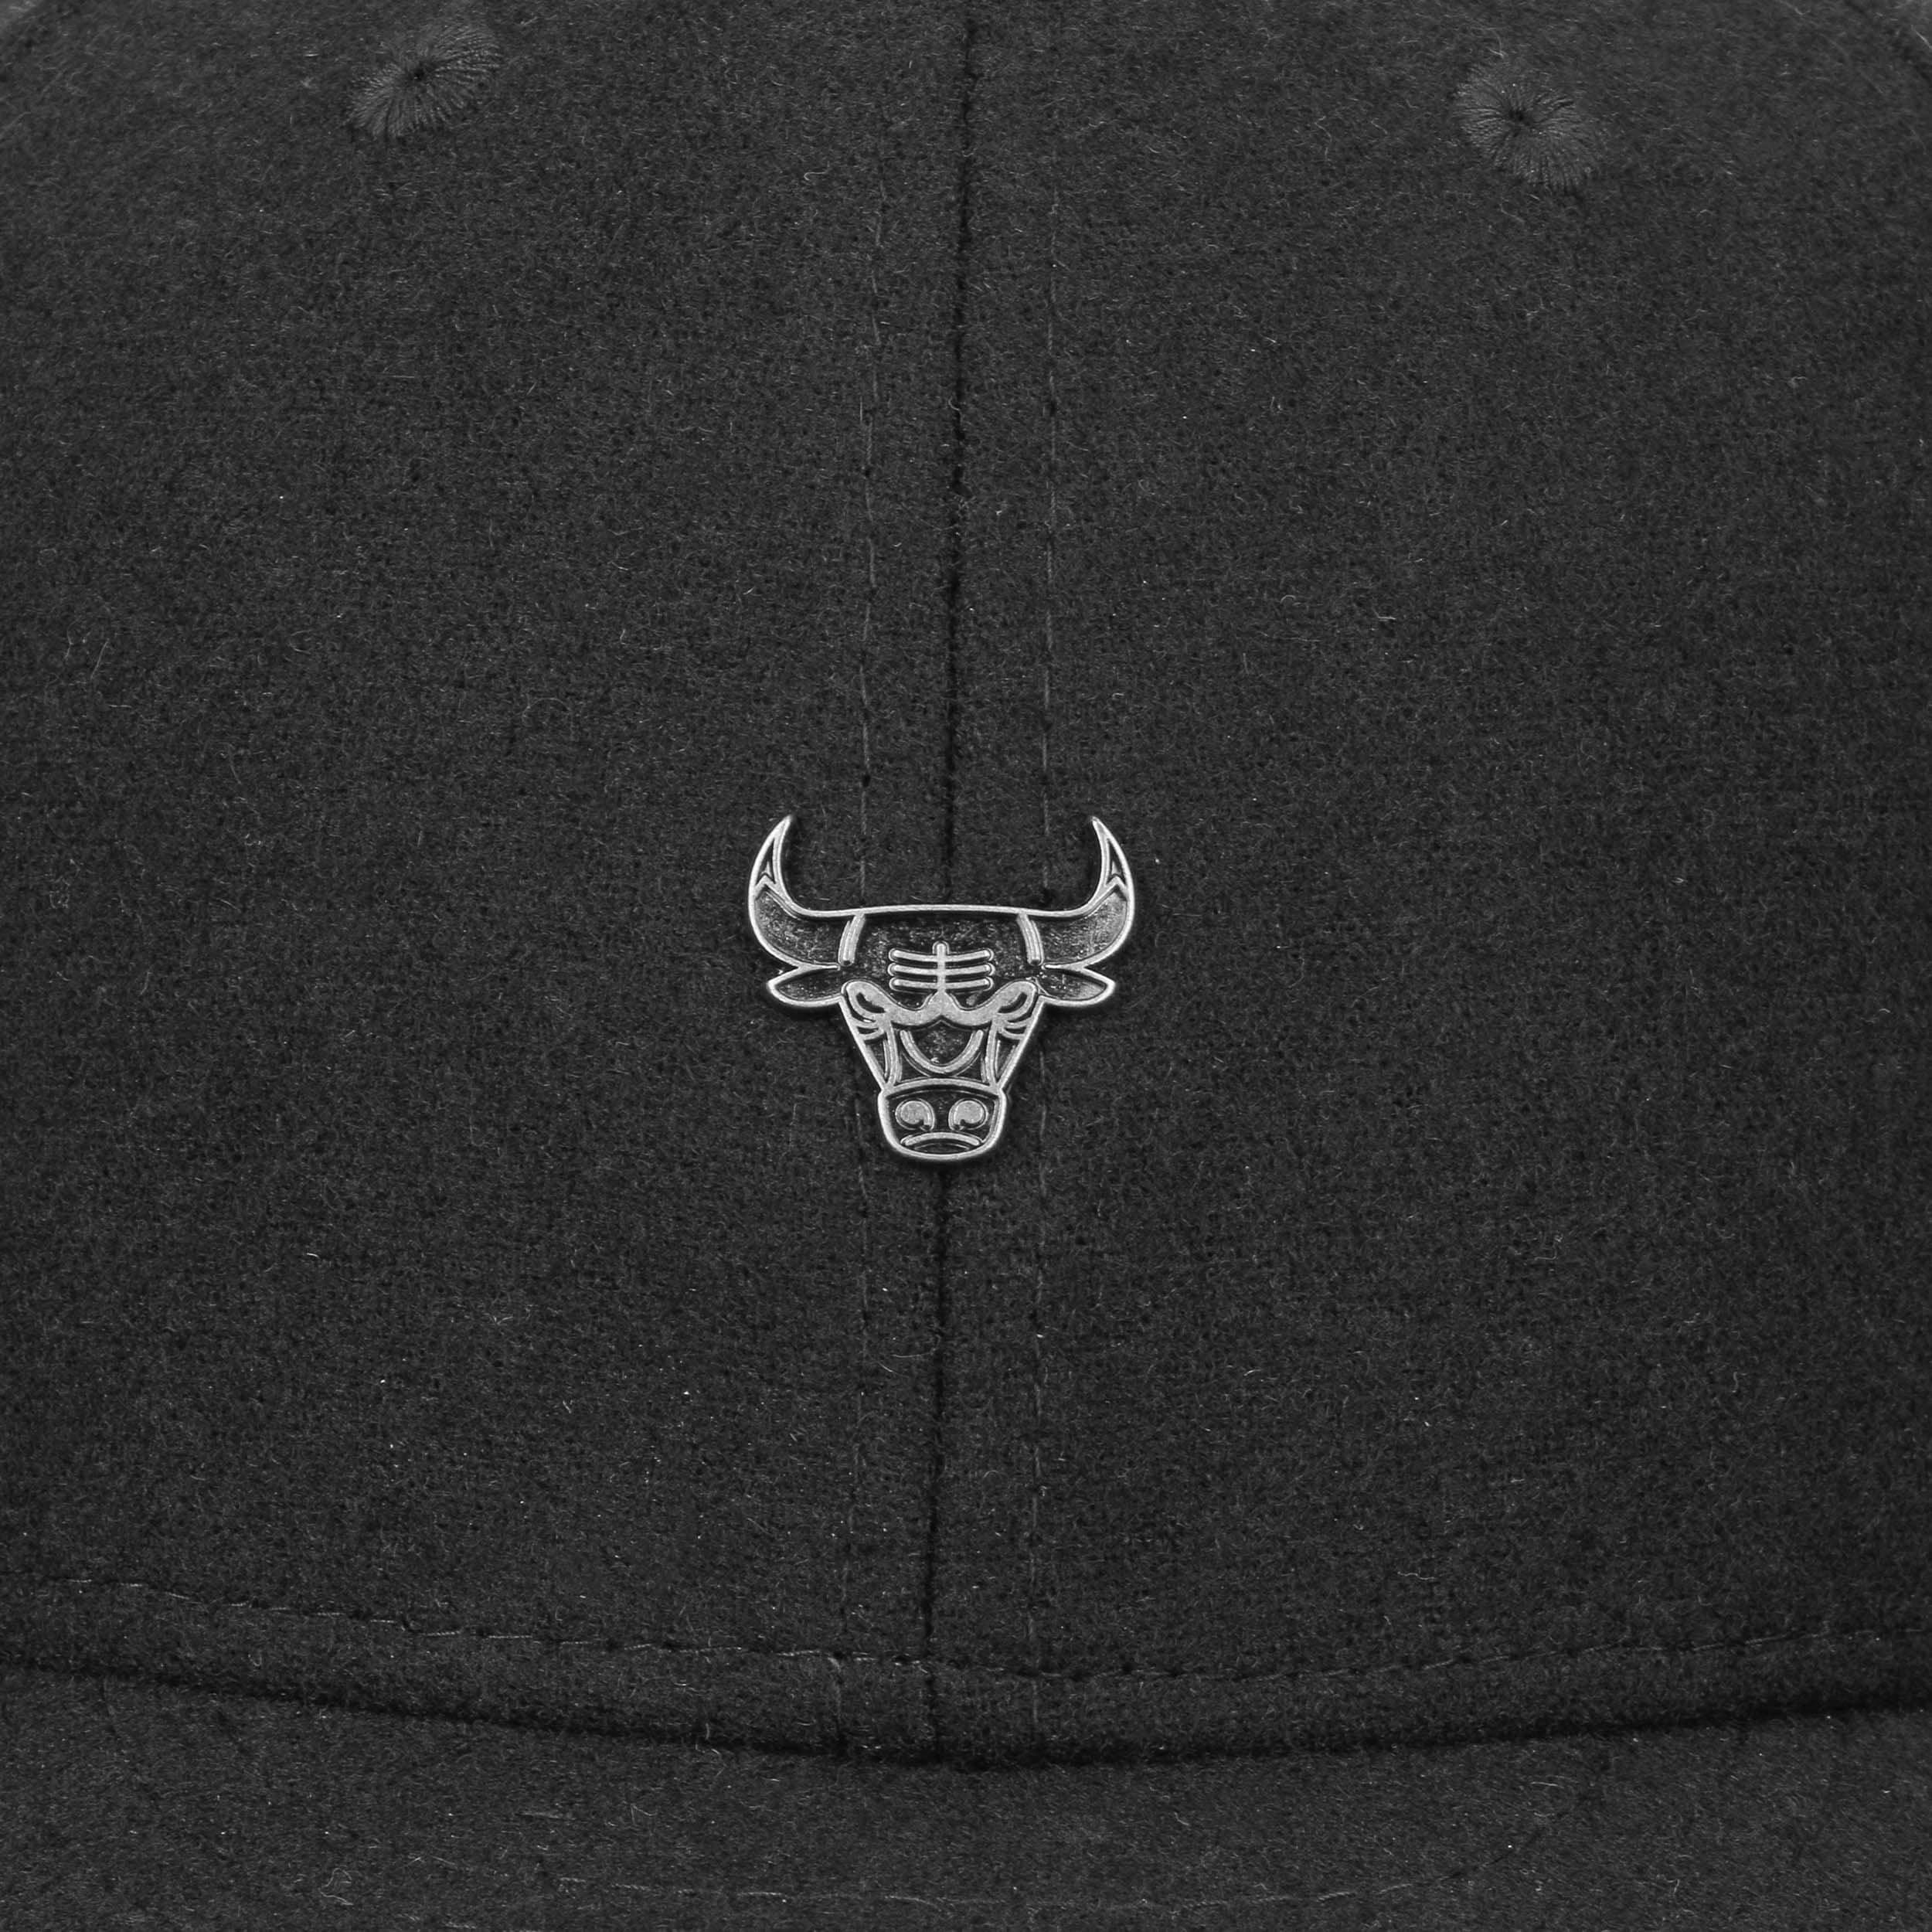 933cc3a4 ... 59Fifty Low Profile Pin Bulls Cap by New Era - black 5 ...